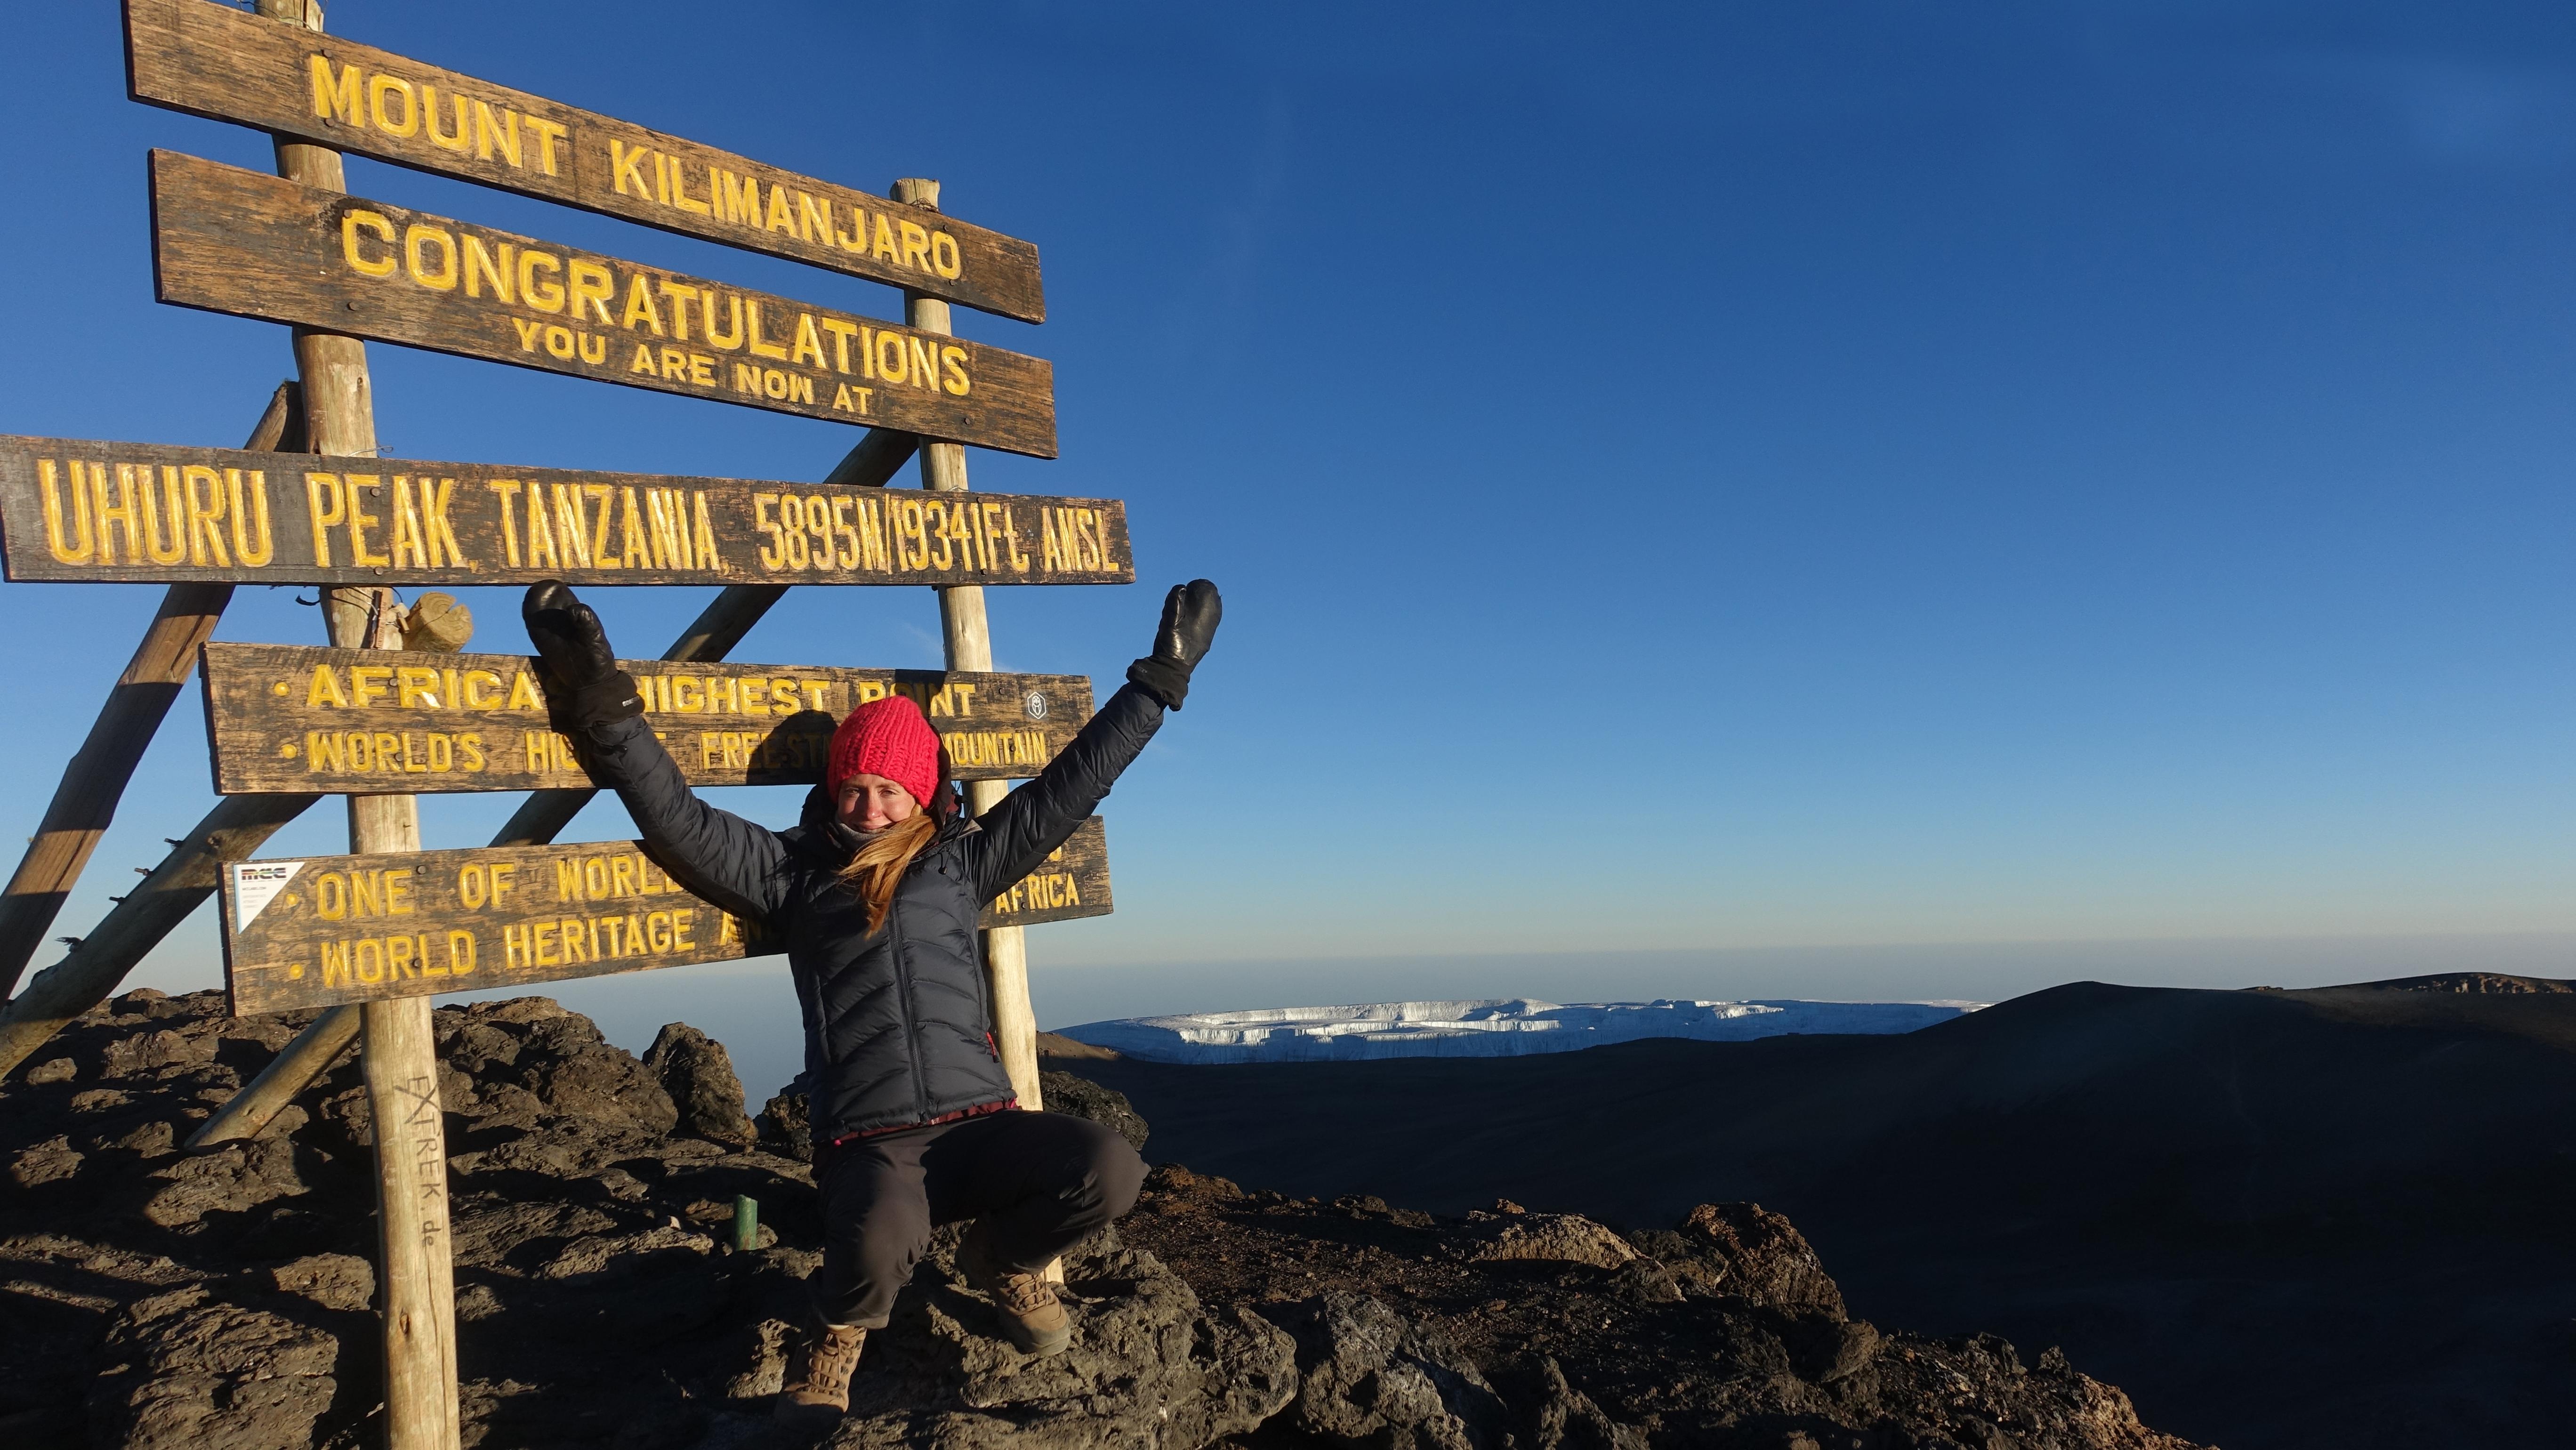 The Ultimate Guide   Climbing Mount Kilimanjaro